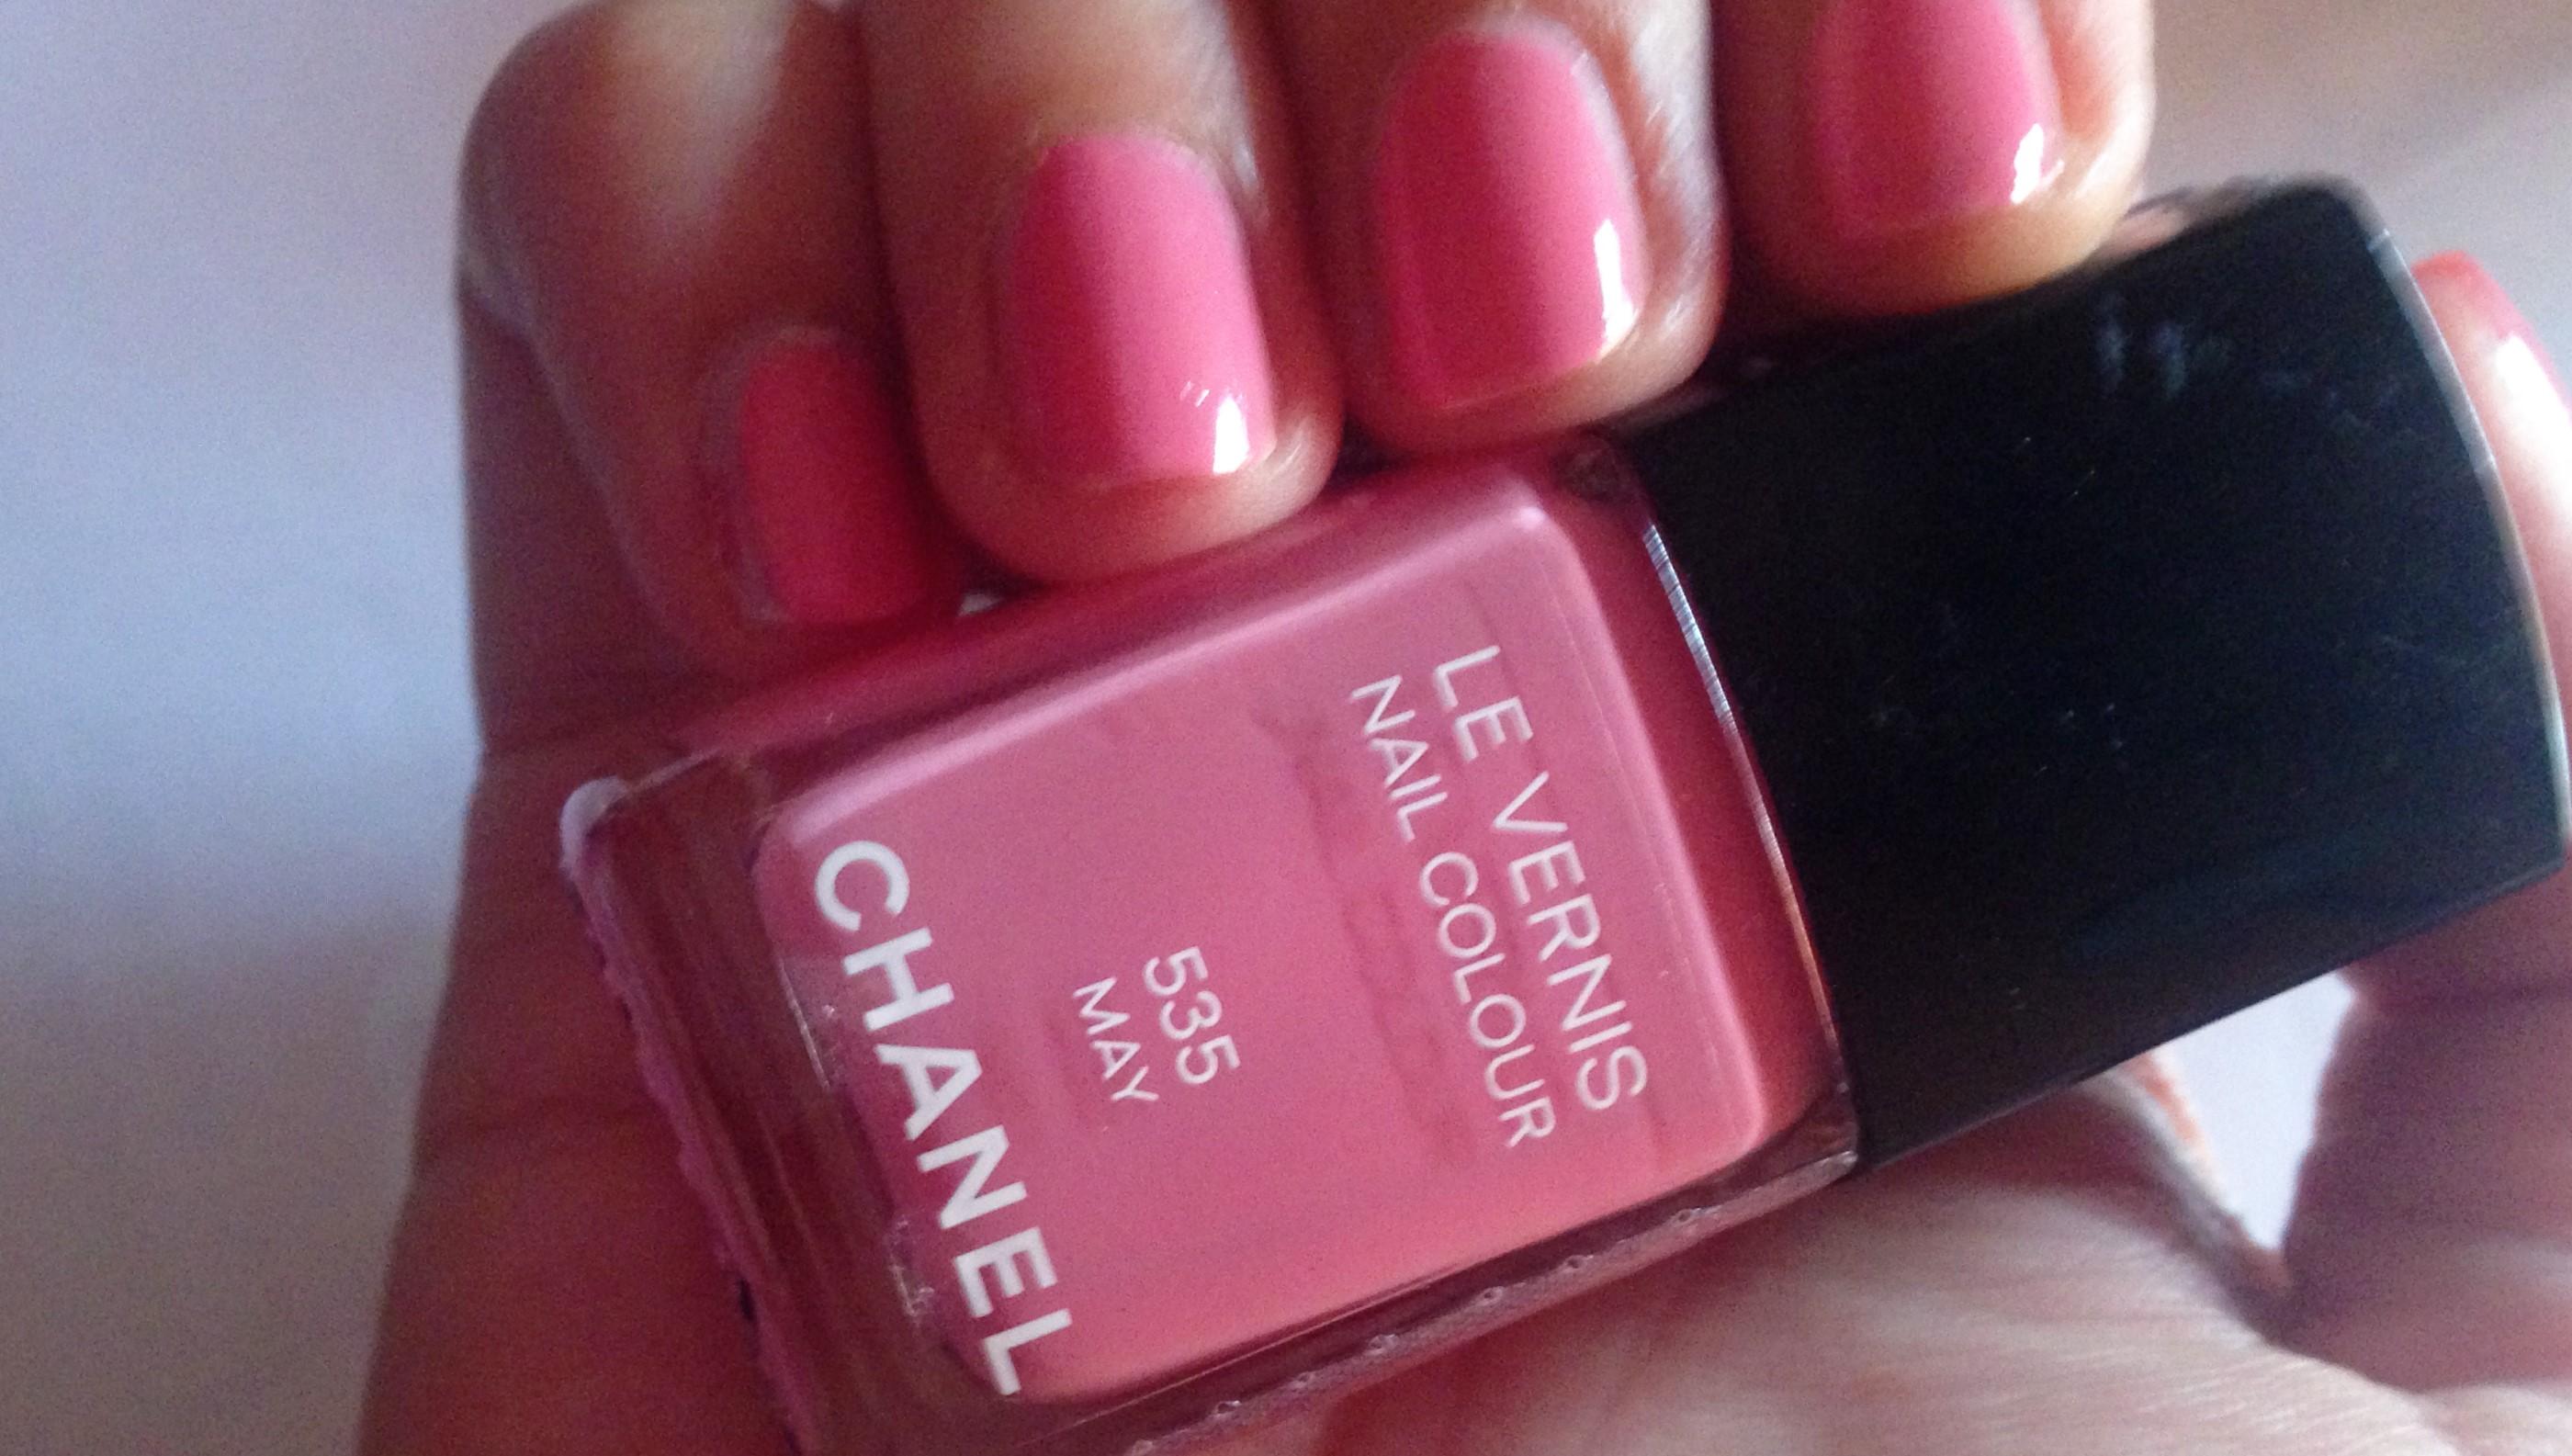 swatch Smalto Chanel May